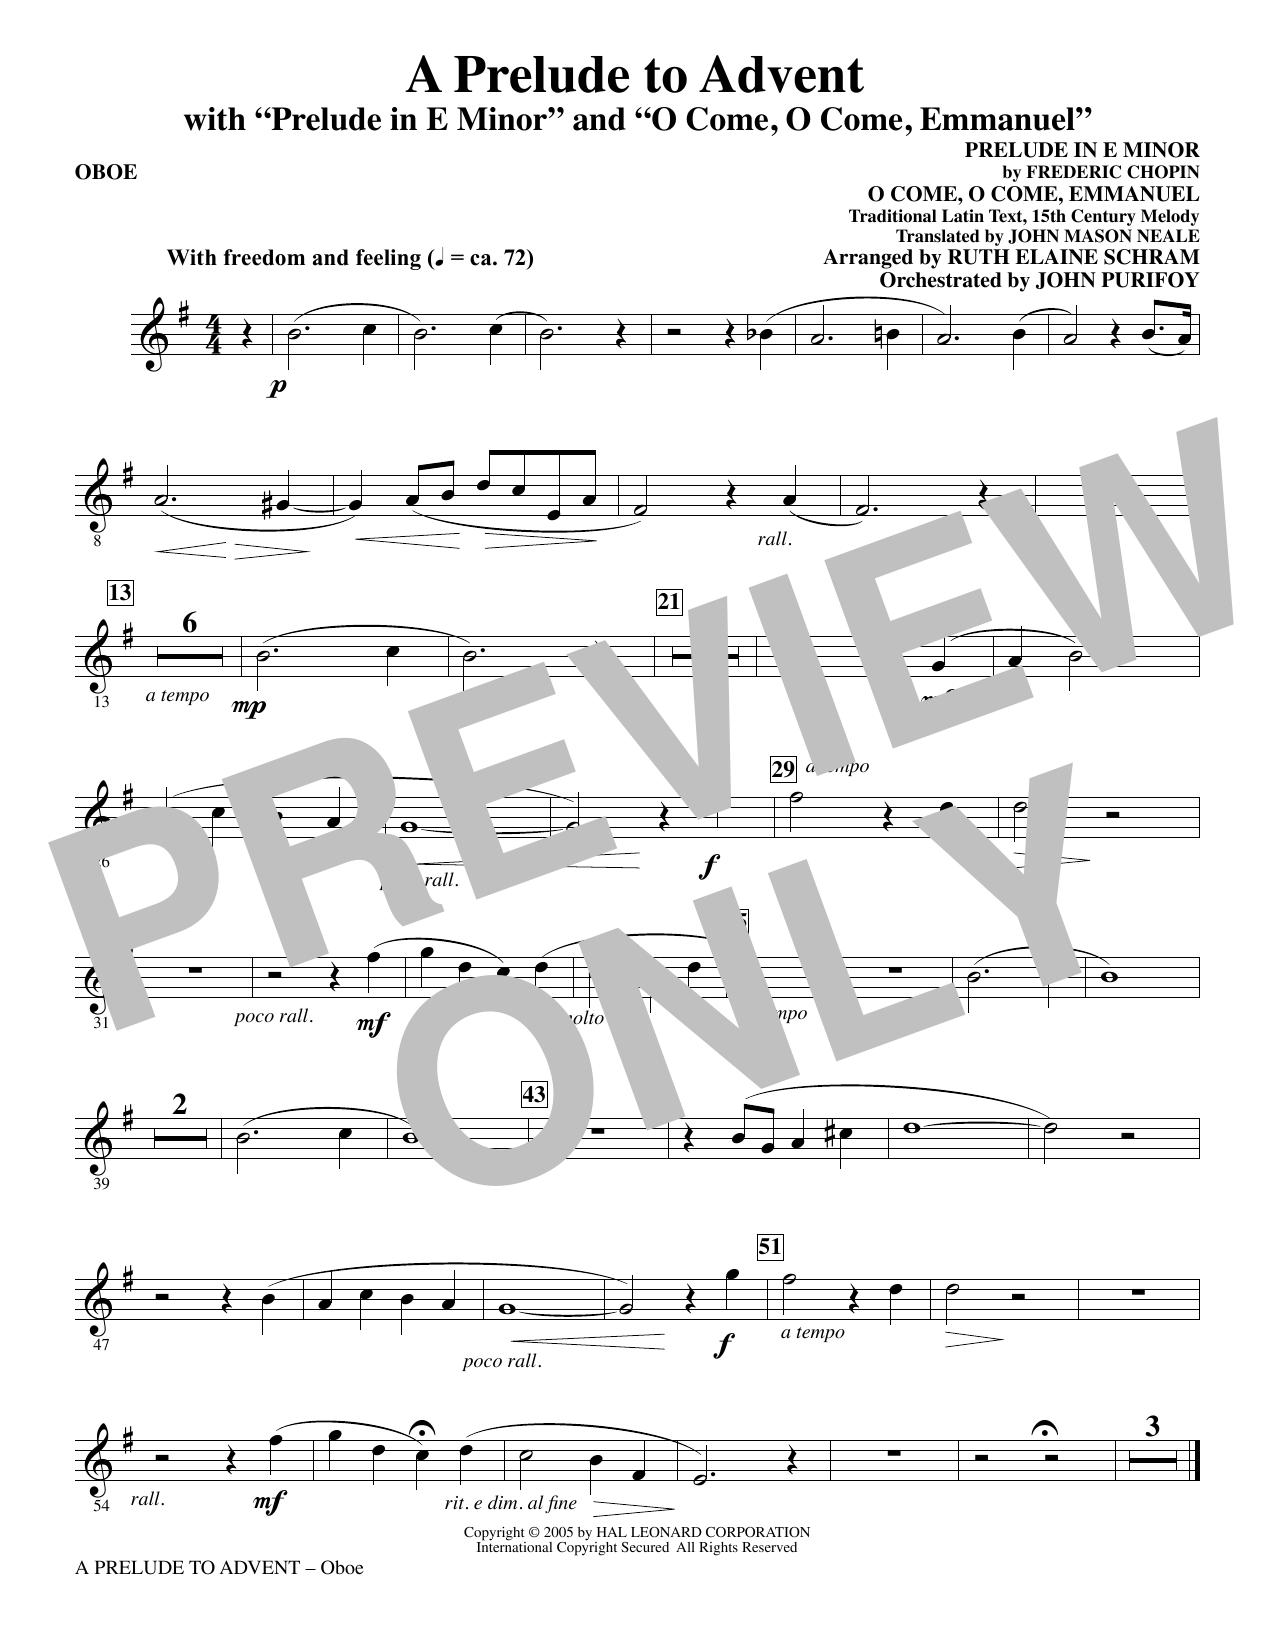 A Prelude To Advent (with Prelude In E Minor and O Come, O Come, Emmanuel) - Oboe sheet music